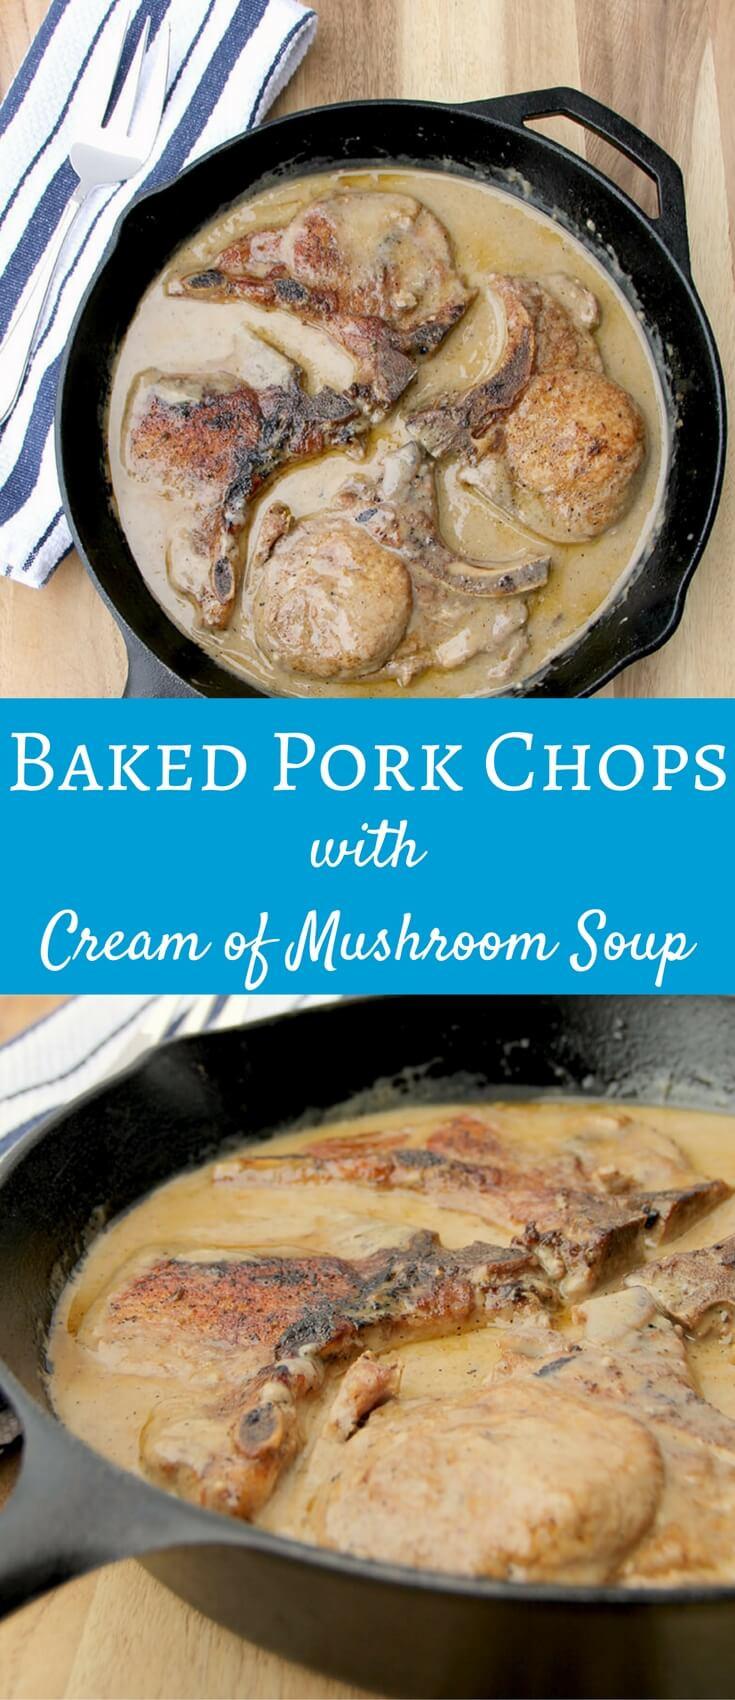 Pork Chops And Rice Cream Of Mushroom  pork chops with cream of mushroom soup in oven with rice